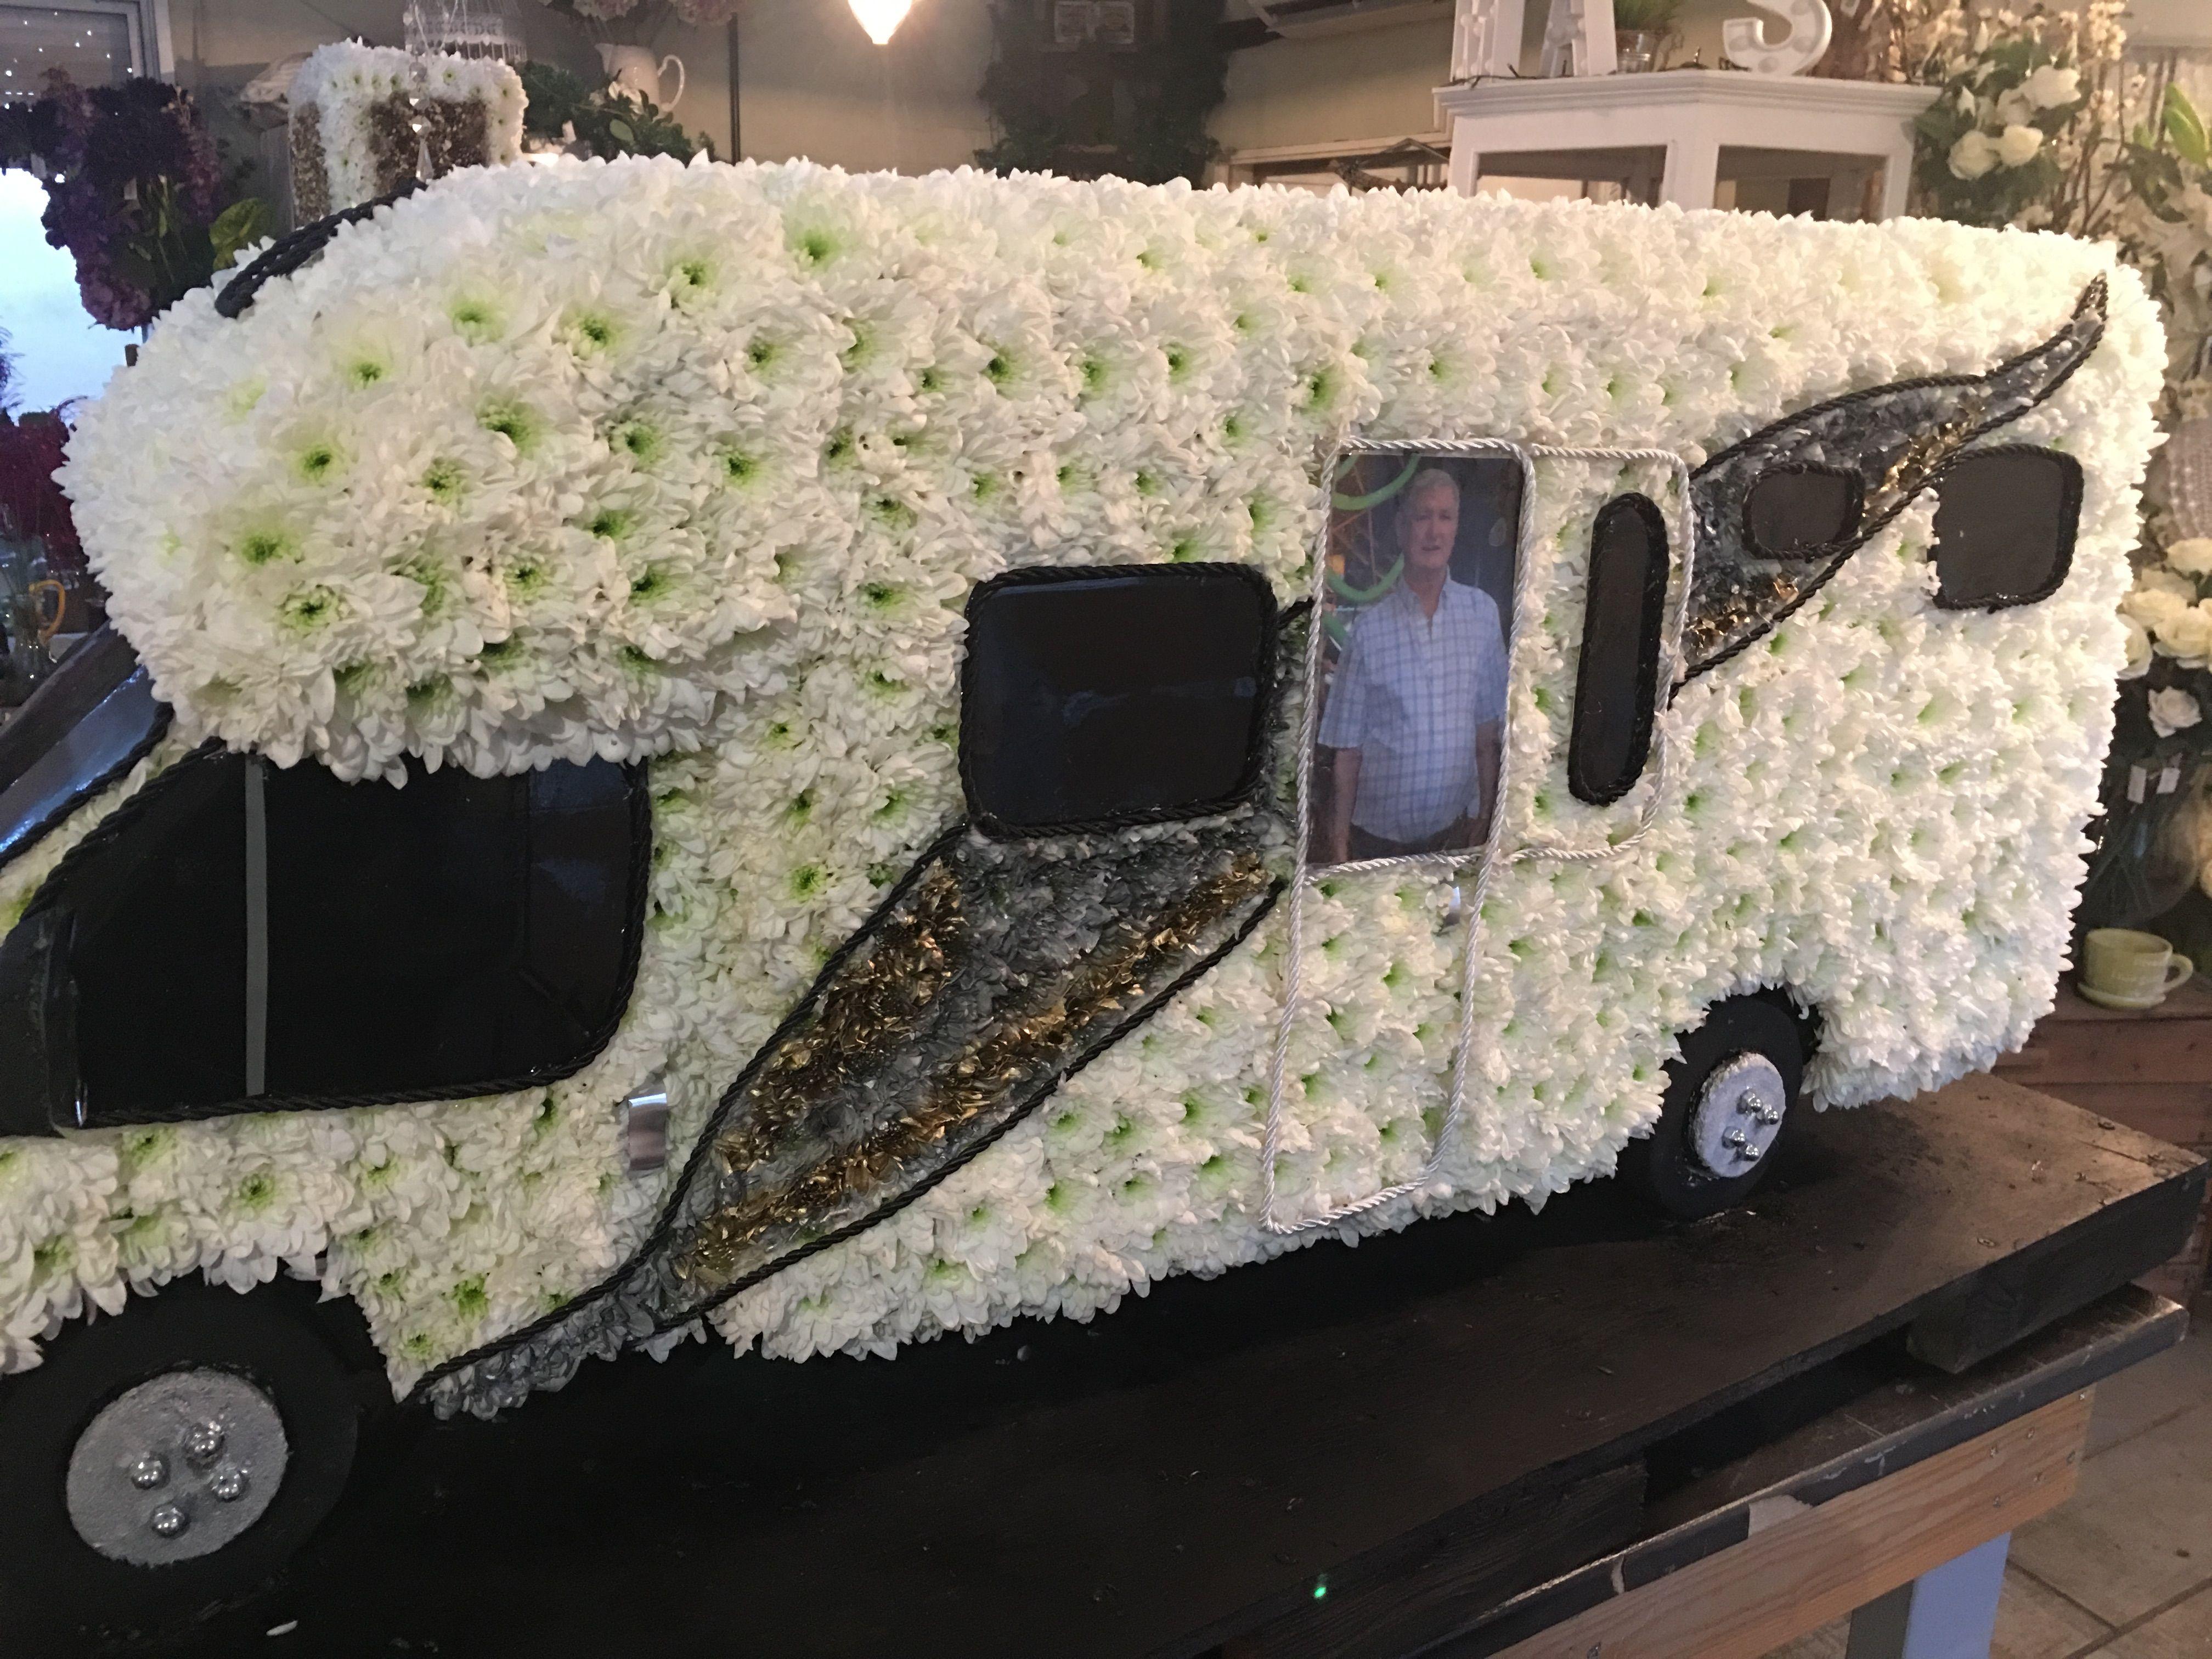 Caravan flower tribute motorhome bespoke funeral flower tributes caravan flower tribute motorhome bespoke funeral flower tributes thefloralartstudio izmirmasajfo